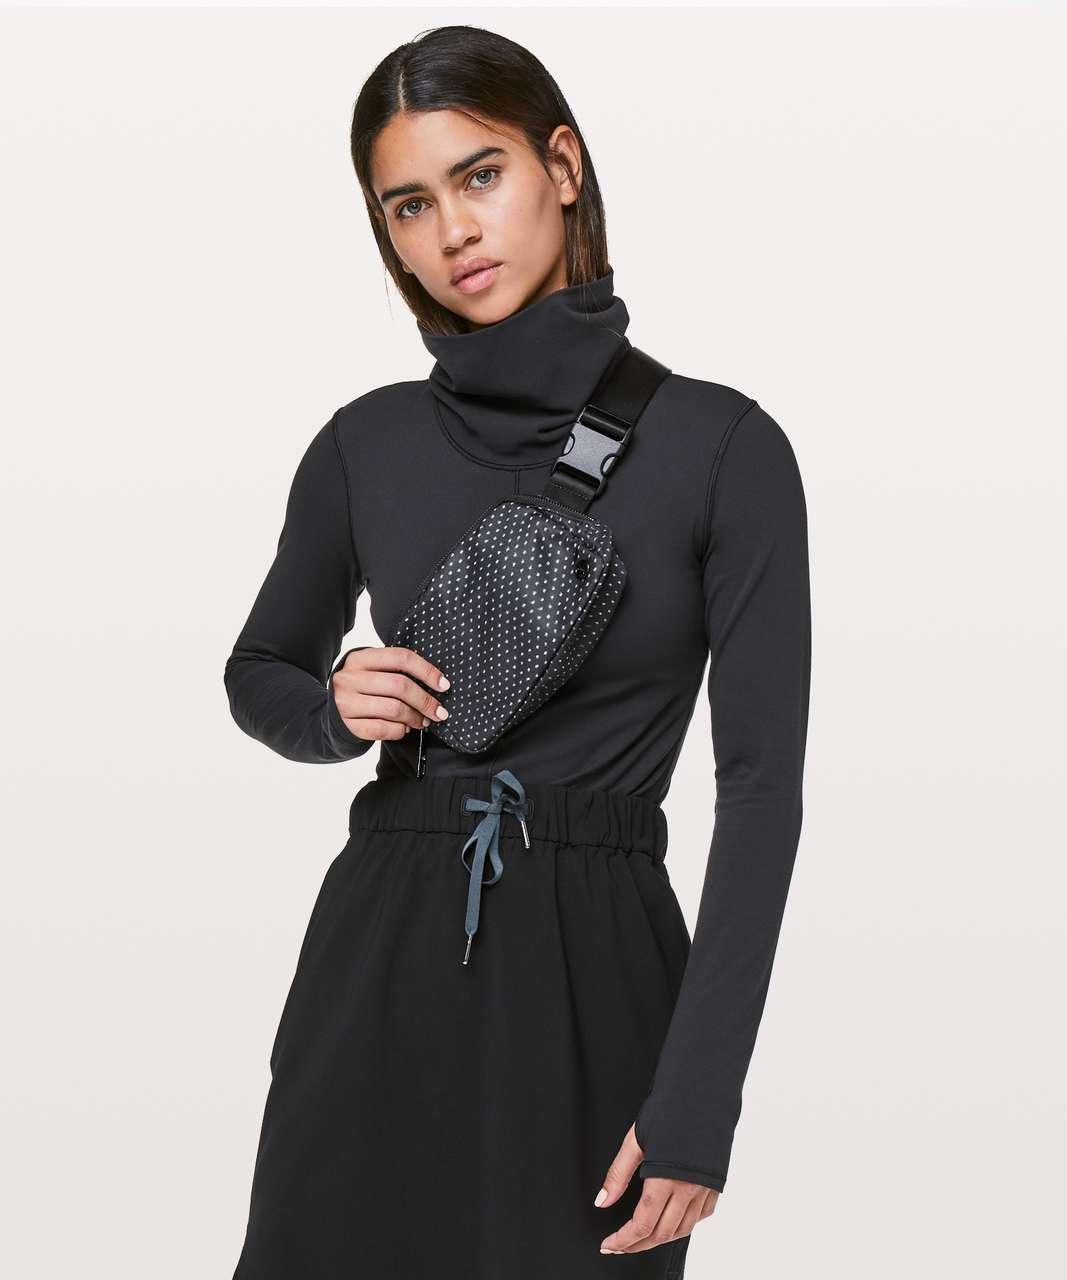 Lululemon Everywhere Belt Bag *1L - Ikat Needle Dot Grey Black / Black